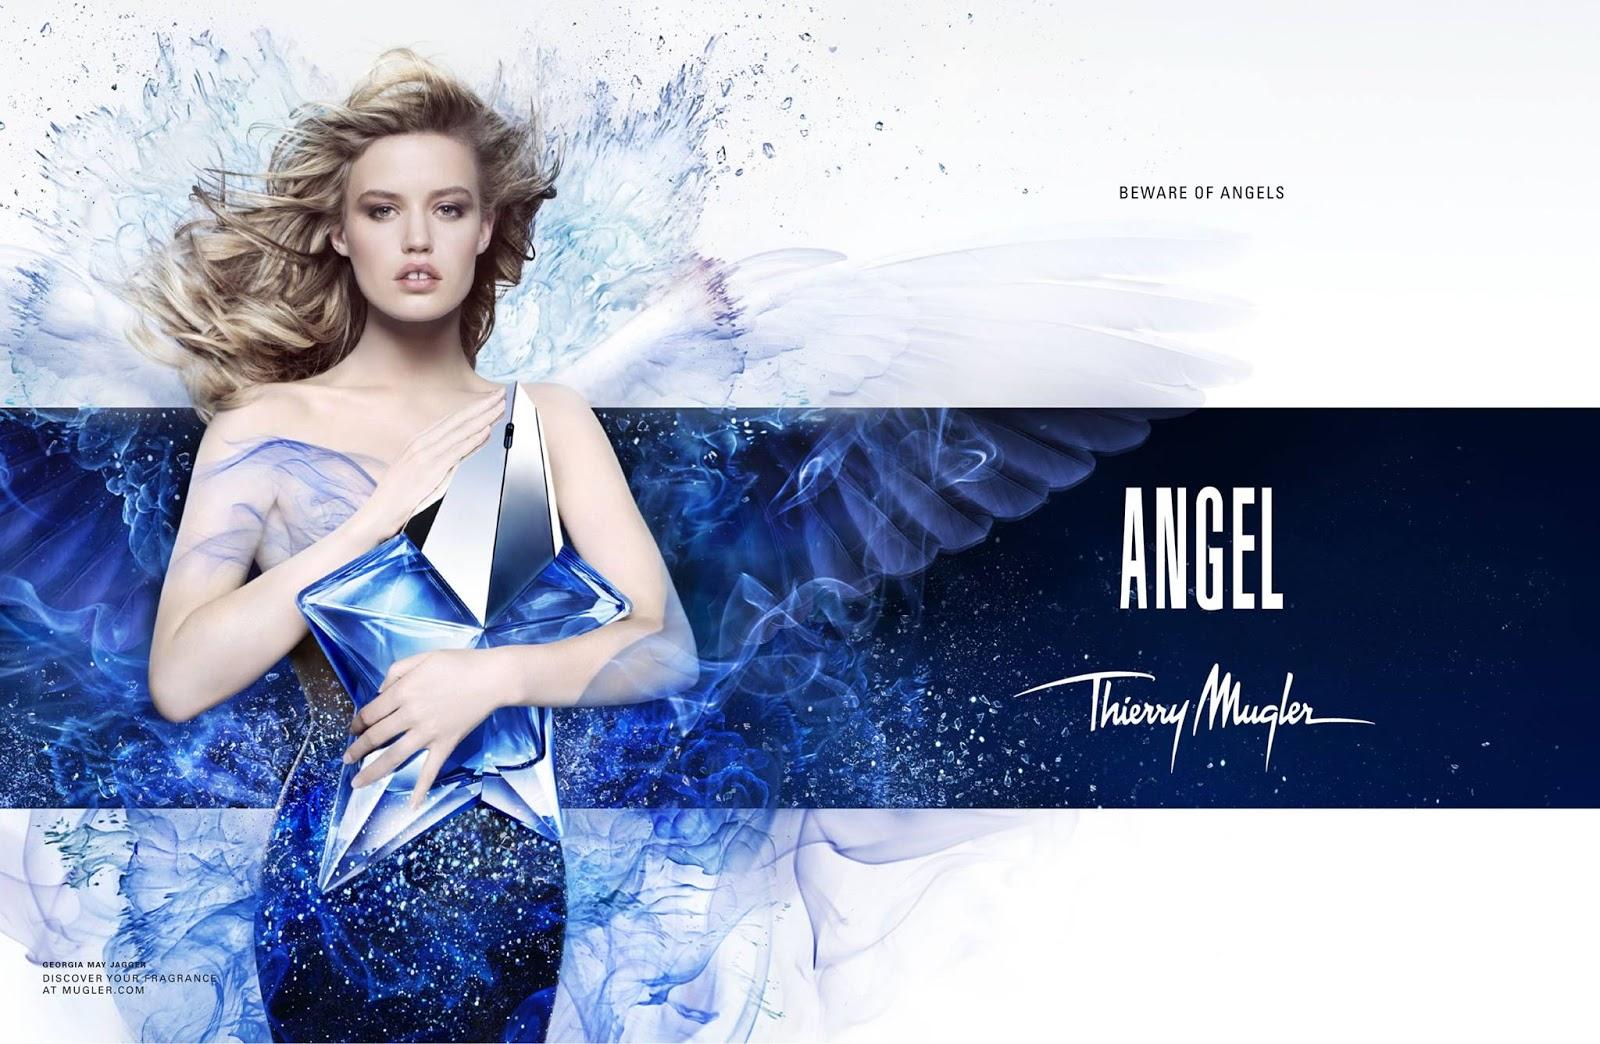 angel profumo opinione